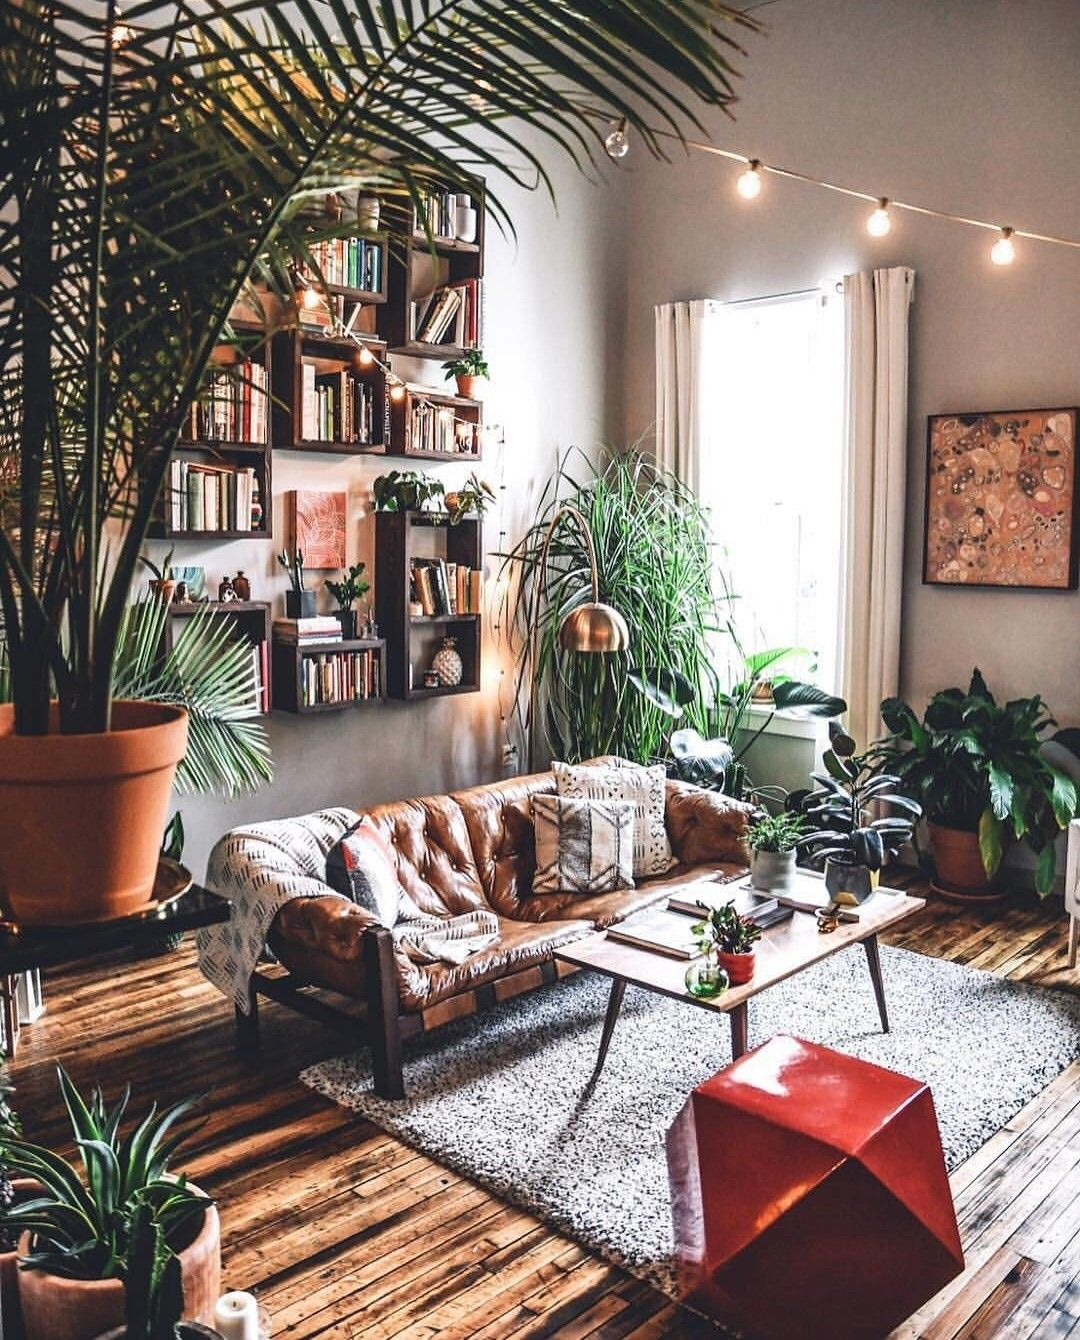 pin by bohoasis on boho decor interior design interior design living room on kitchen interior boho id=96932